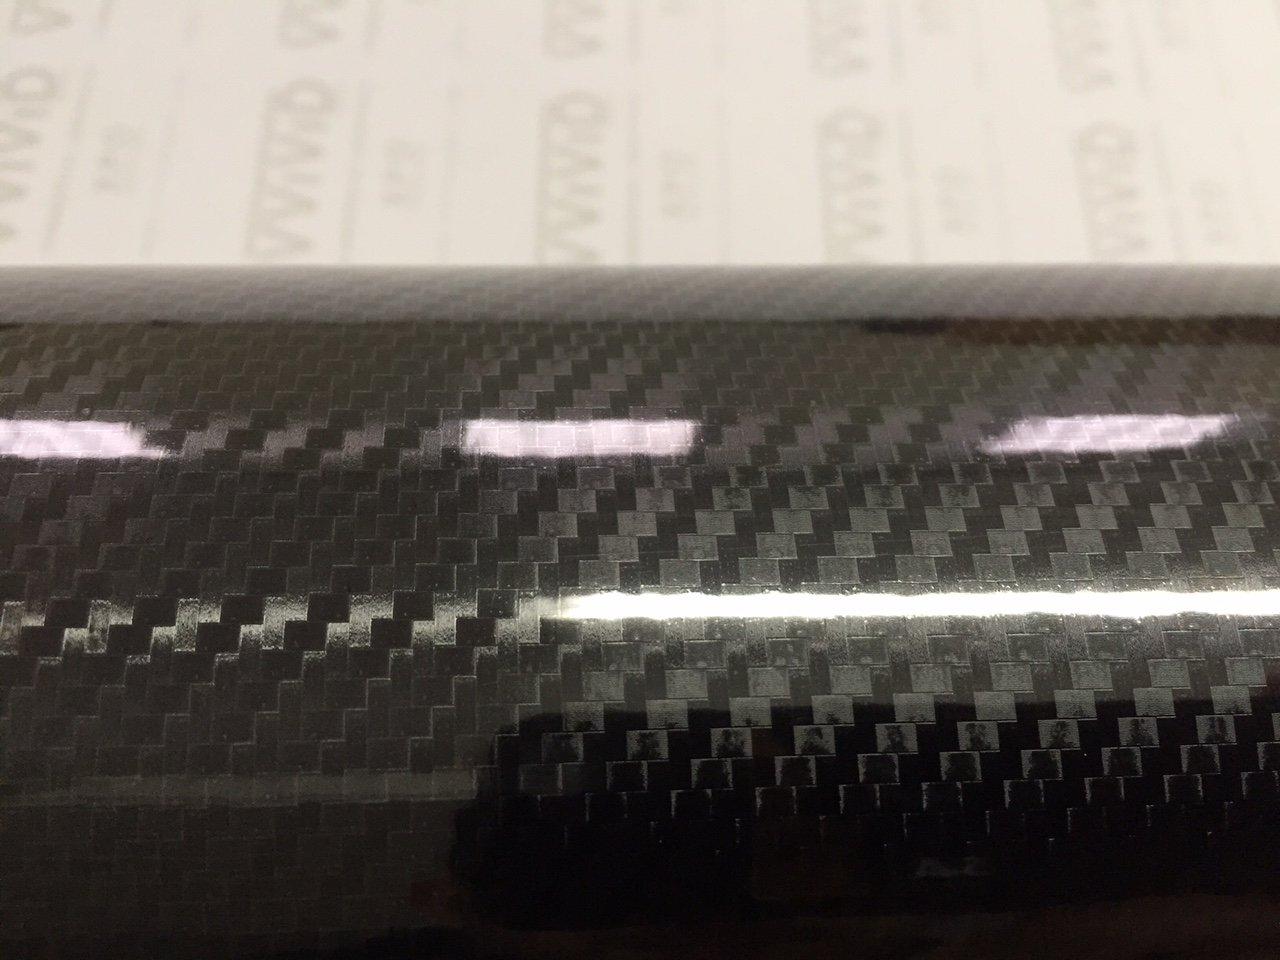 VVIVID Epoxy High Gloss Black Carbon Vinyl Automotive Wrap Film DIY Easy to Install No Mess 1//2ft x 5ft